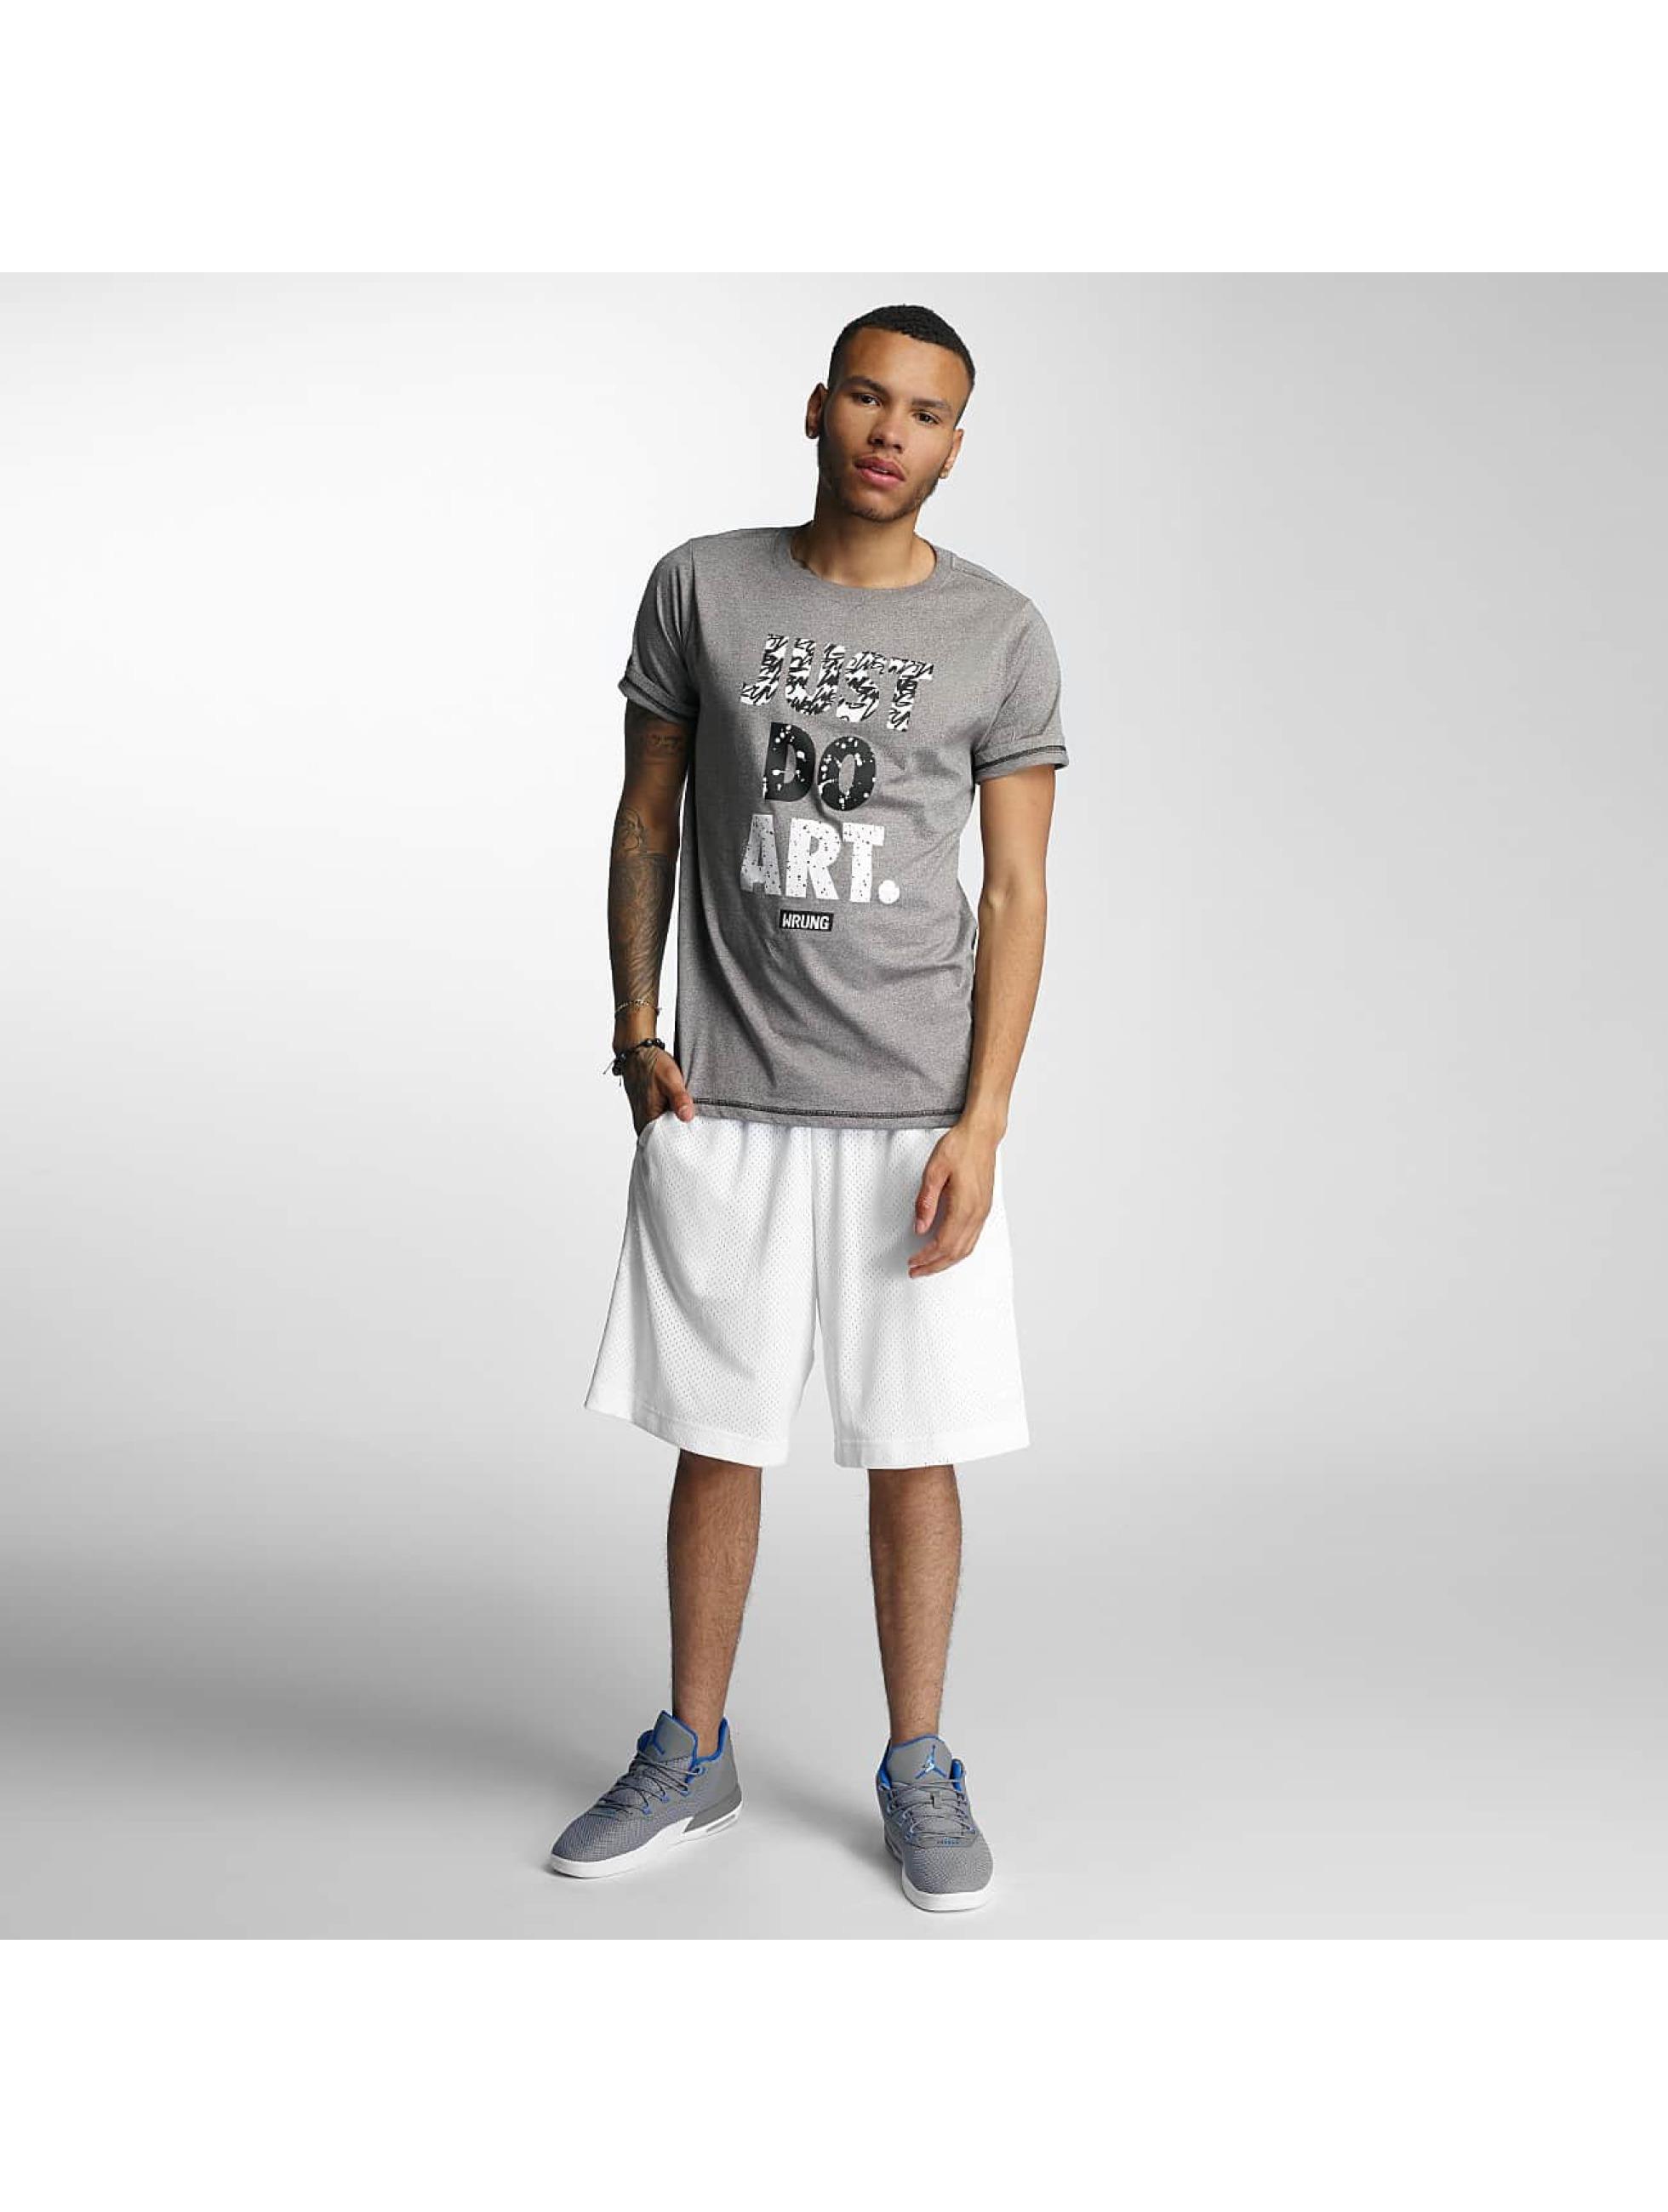 Wrung Division T-Shirt Just Do Art grey